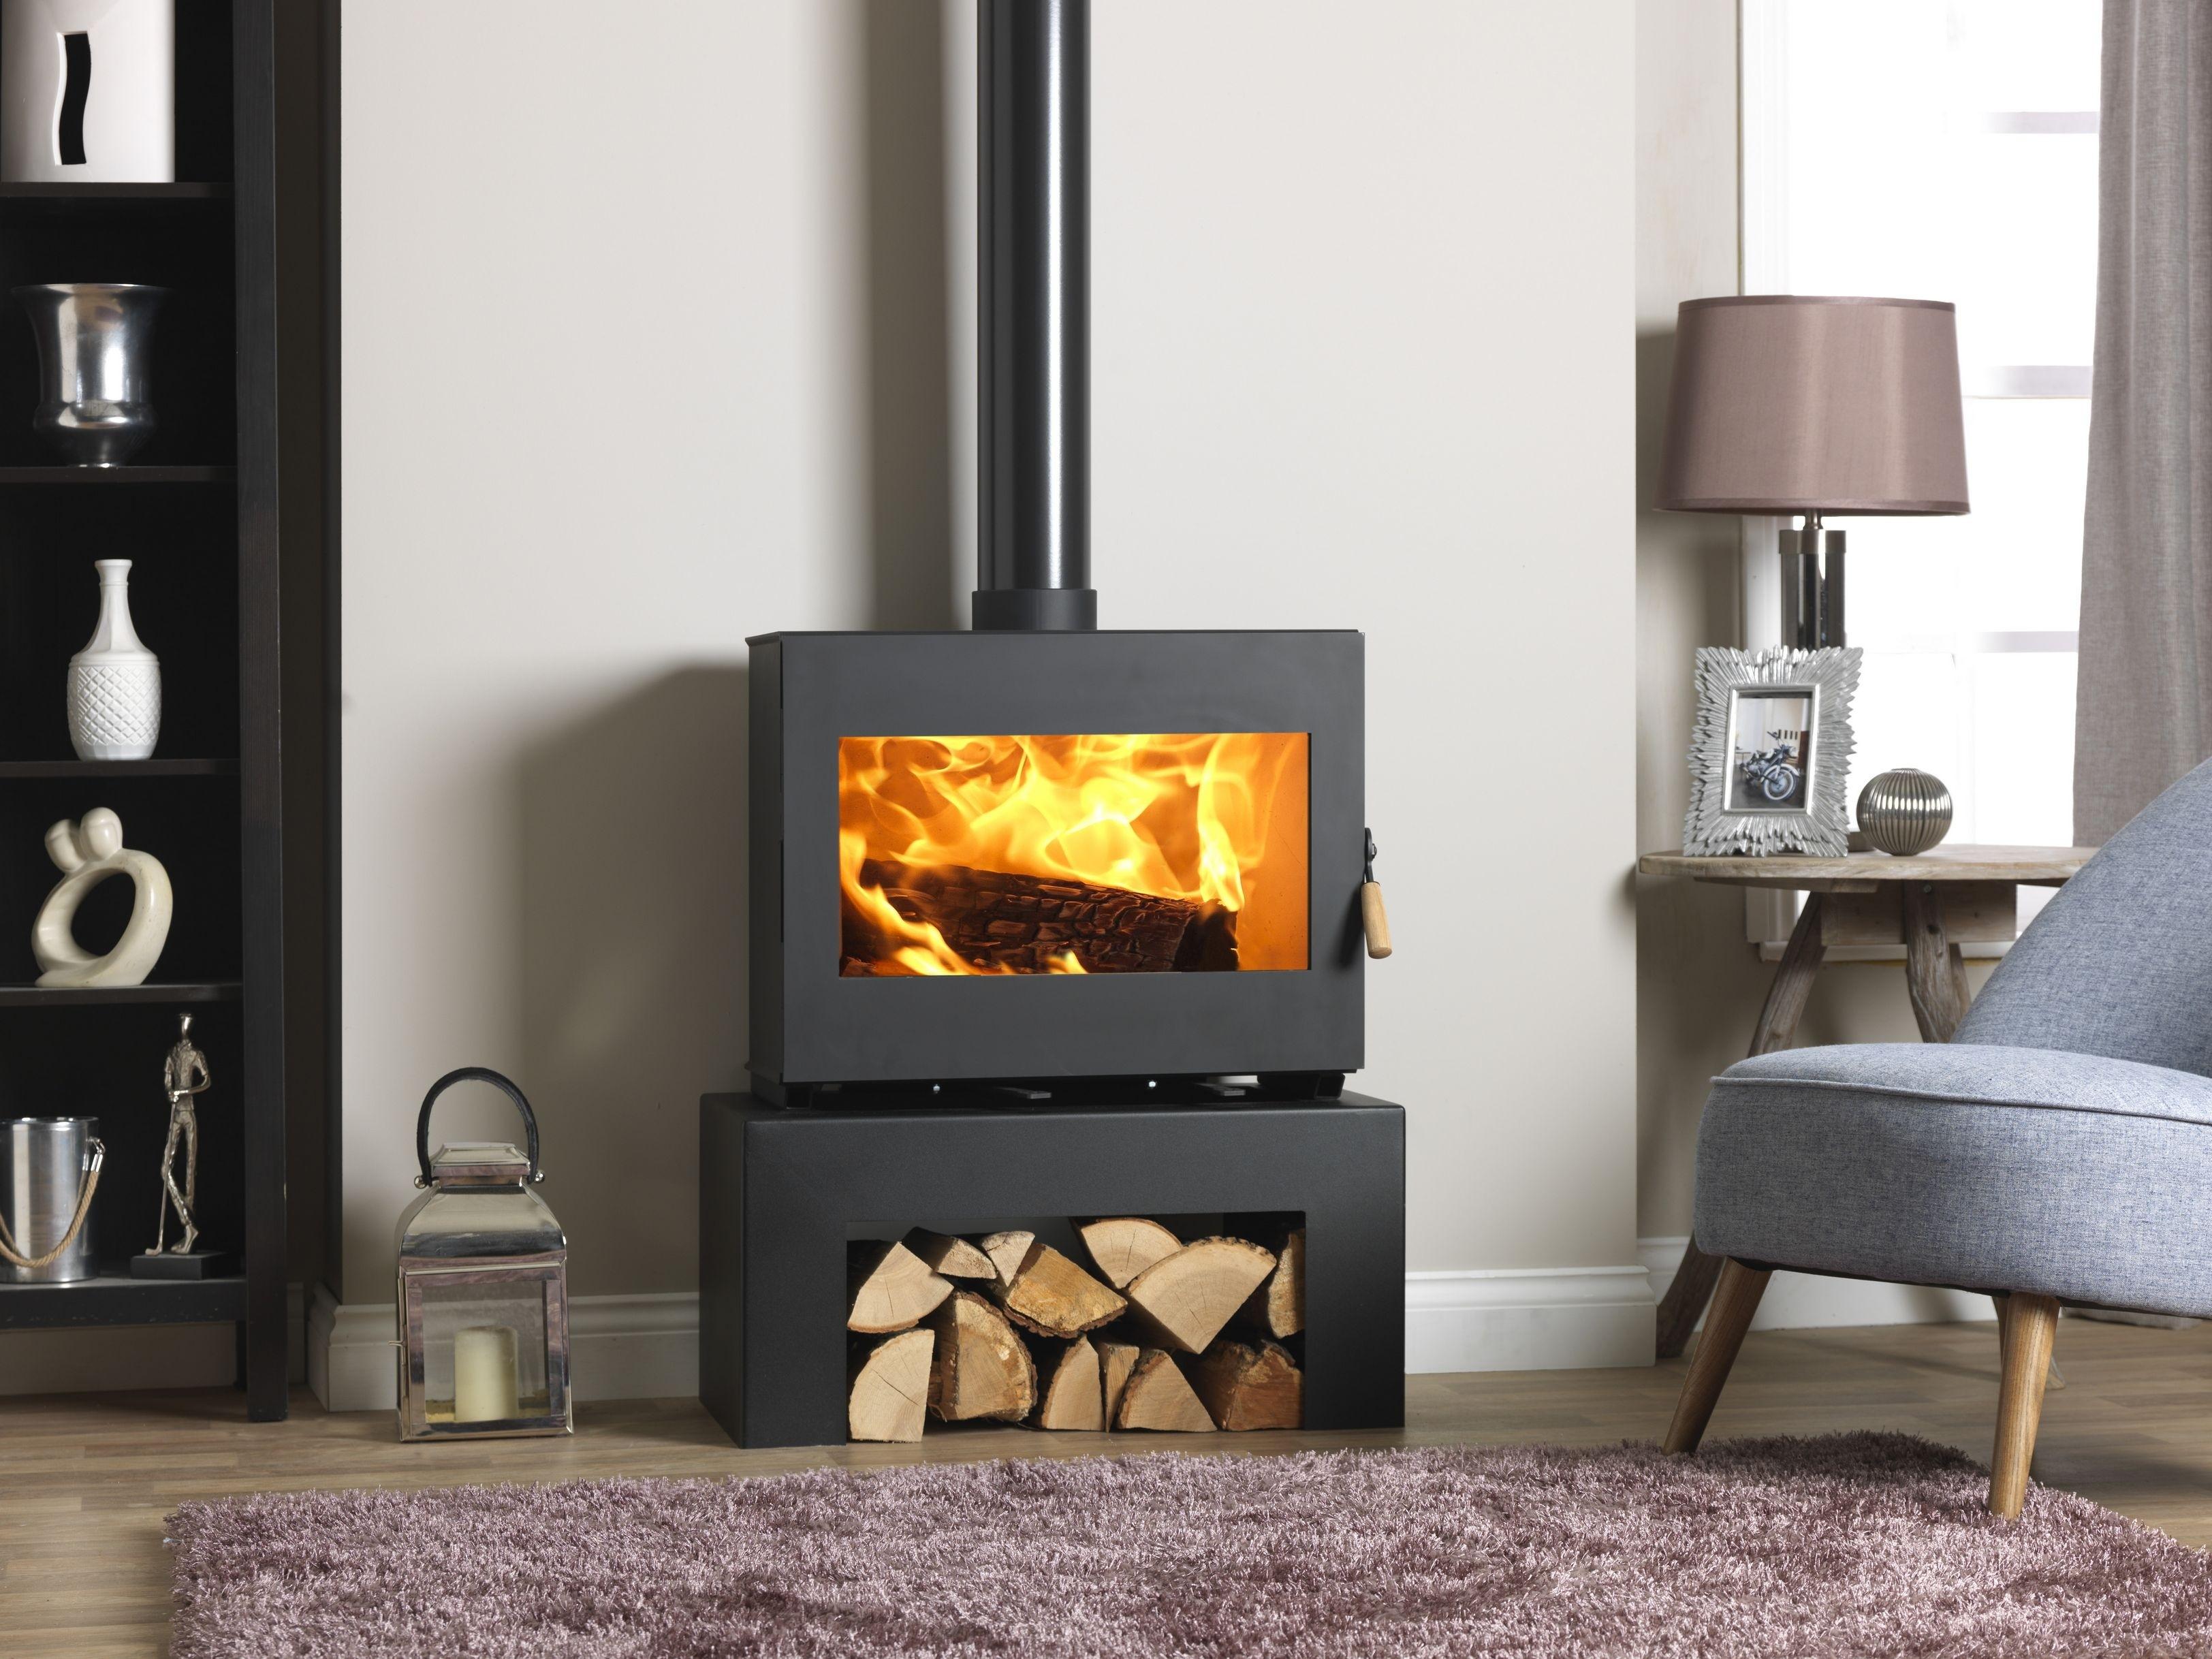 Burley 9507 Briary Panoramic Wood Burning Stove